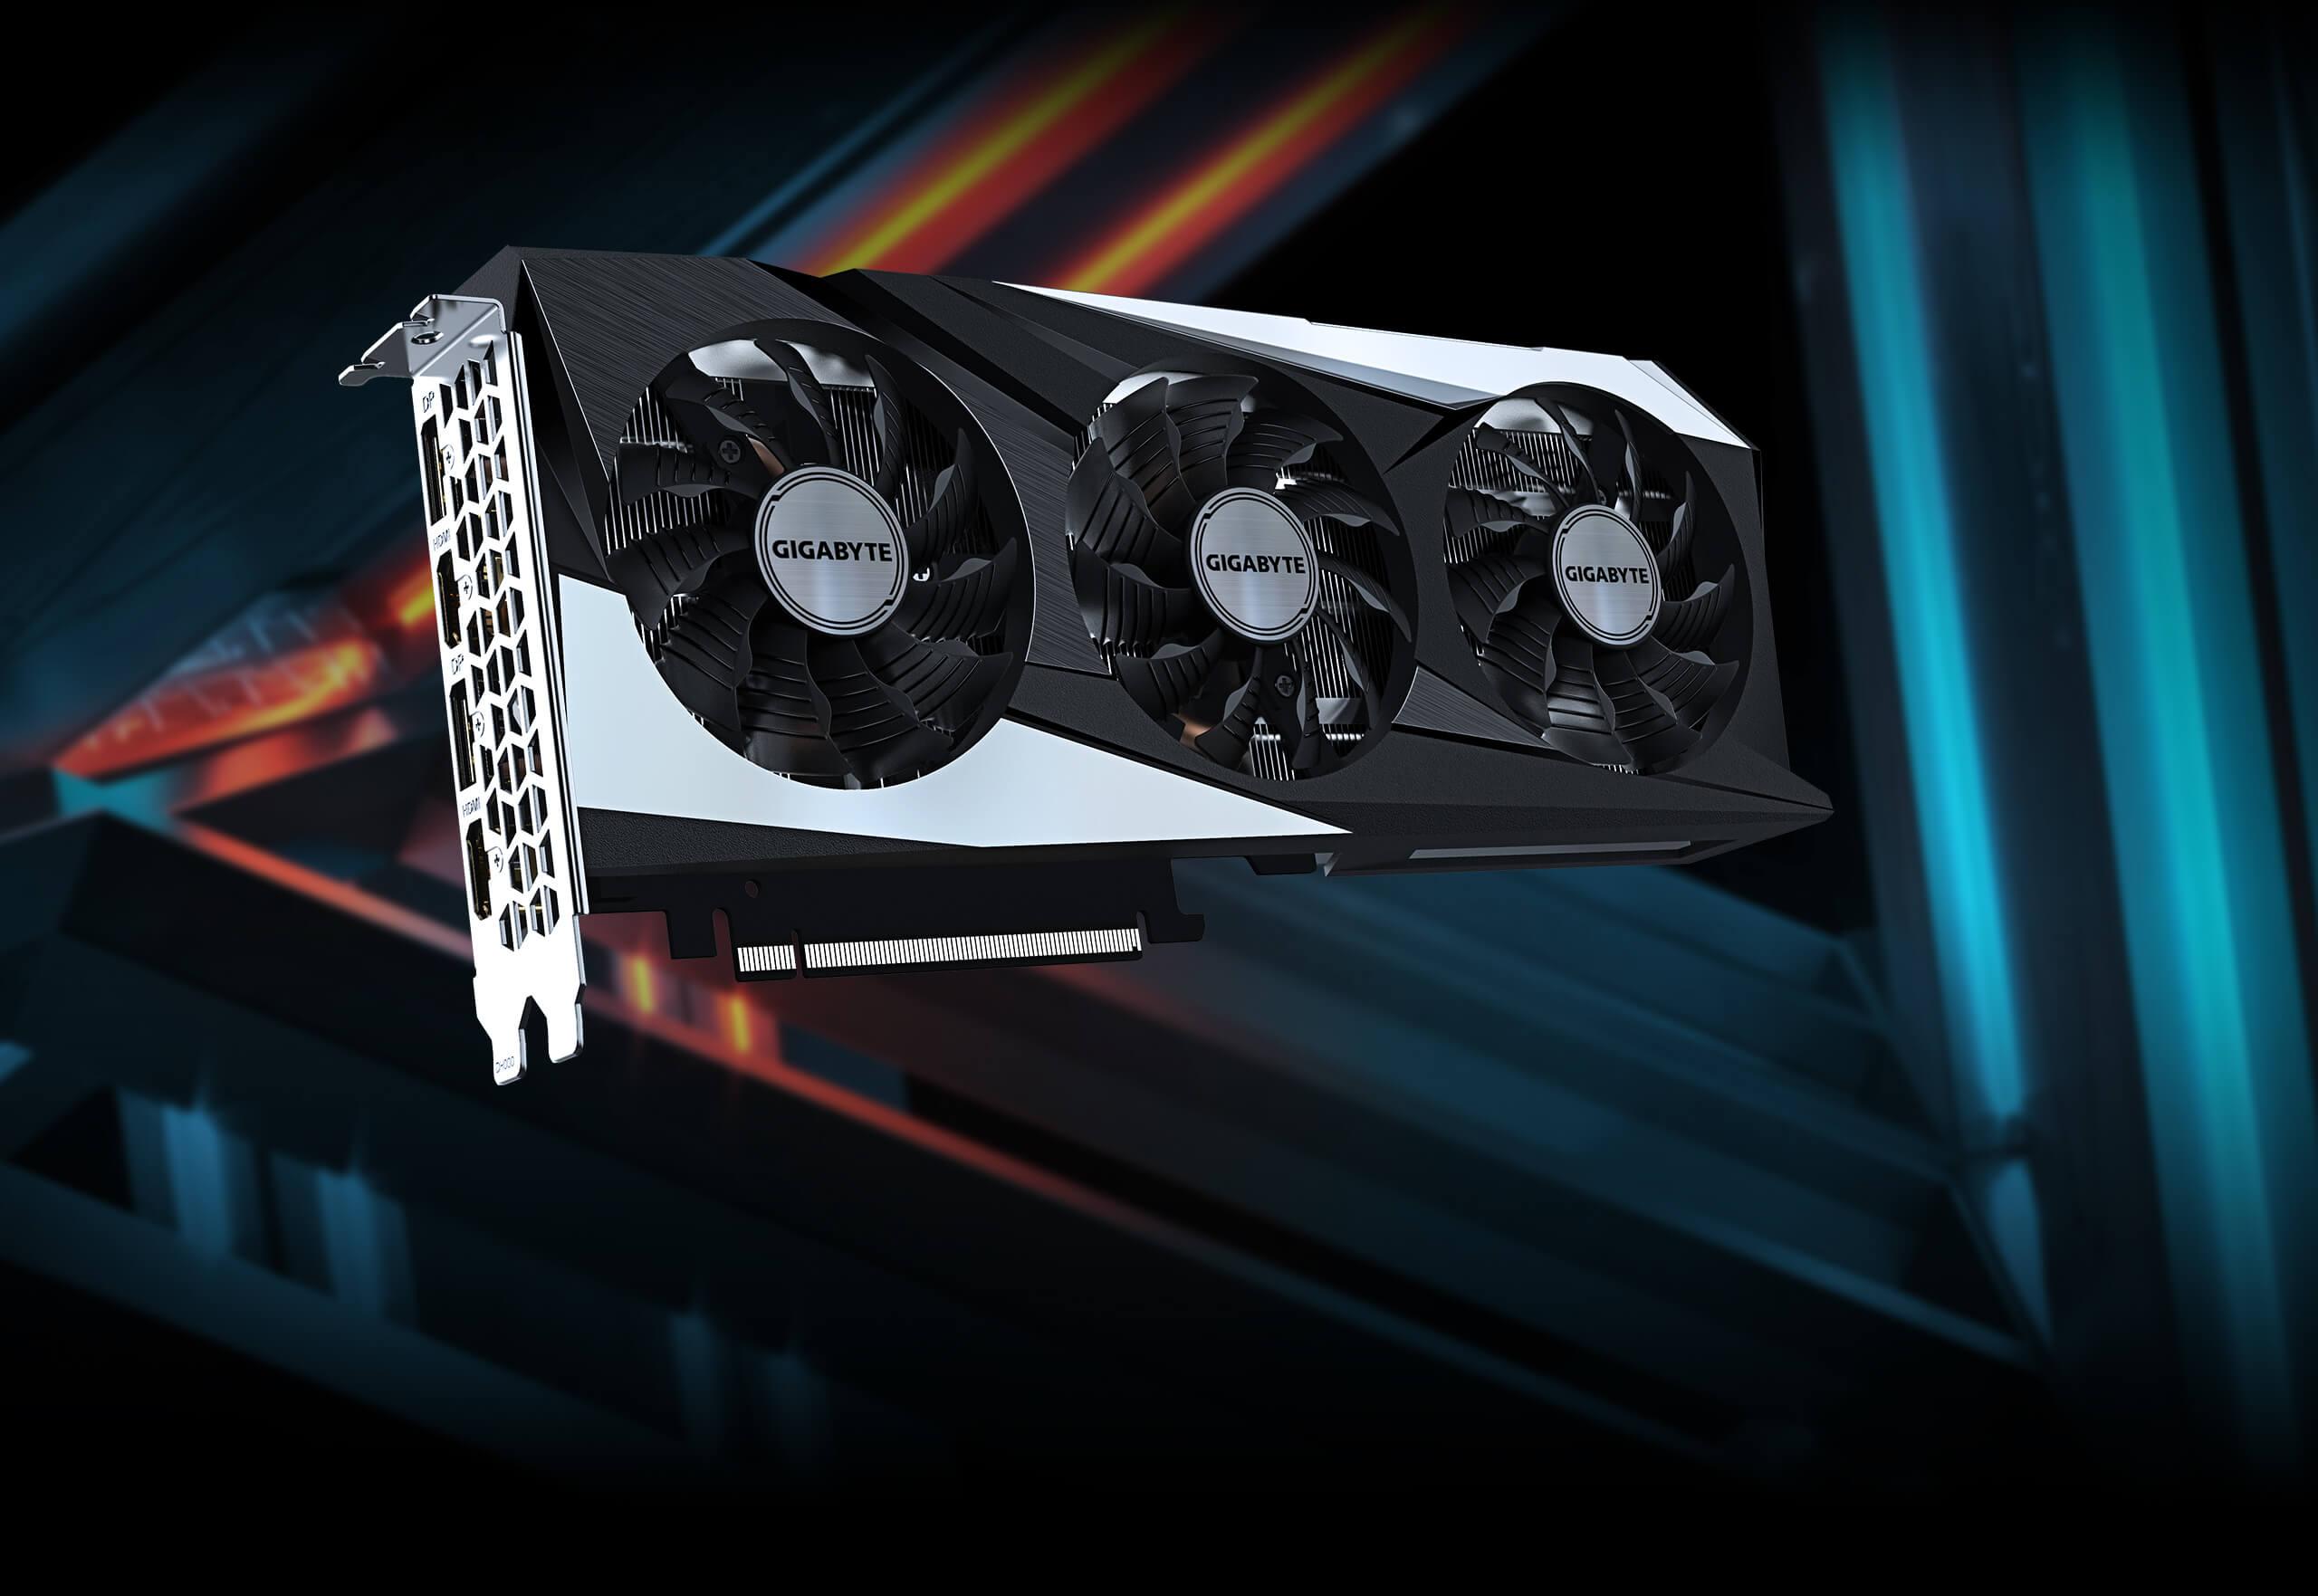 Gigabyte GeForce RTX 3060 GAMING OC 12G - GV-N3060GAMING OC-12GD 9